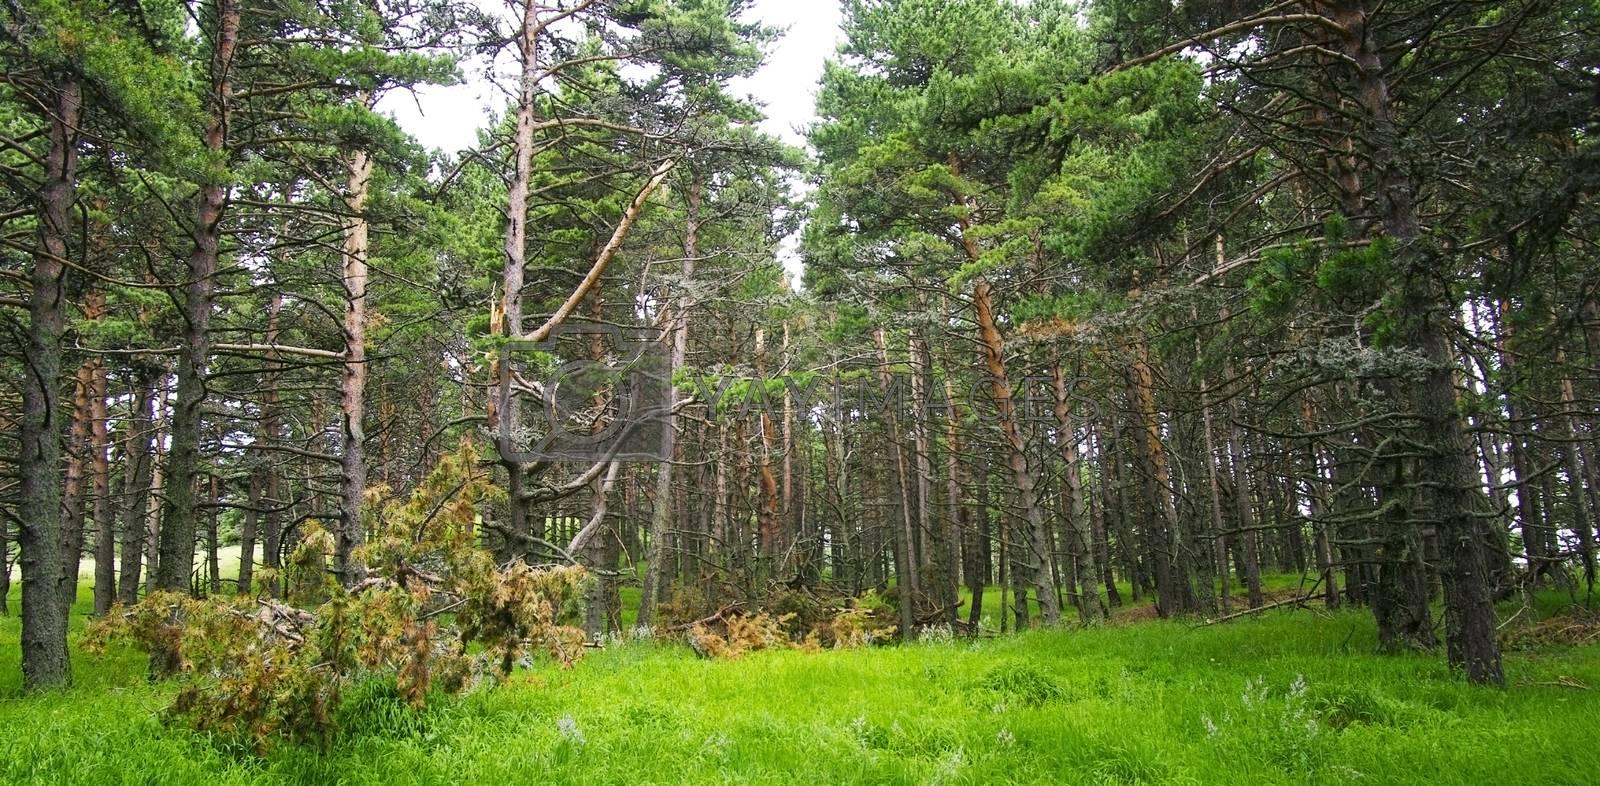 Summer forest (background)